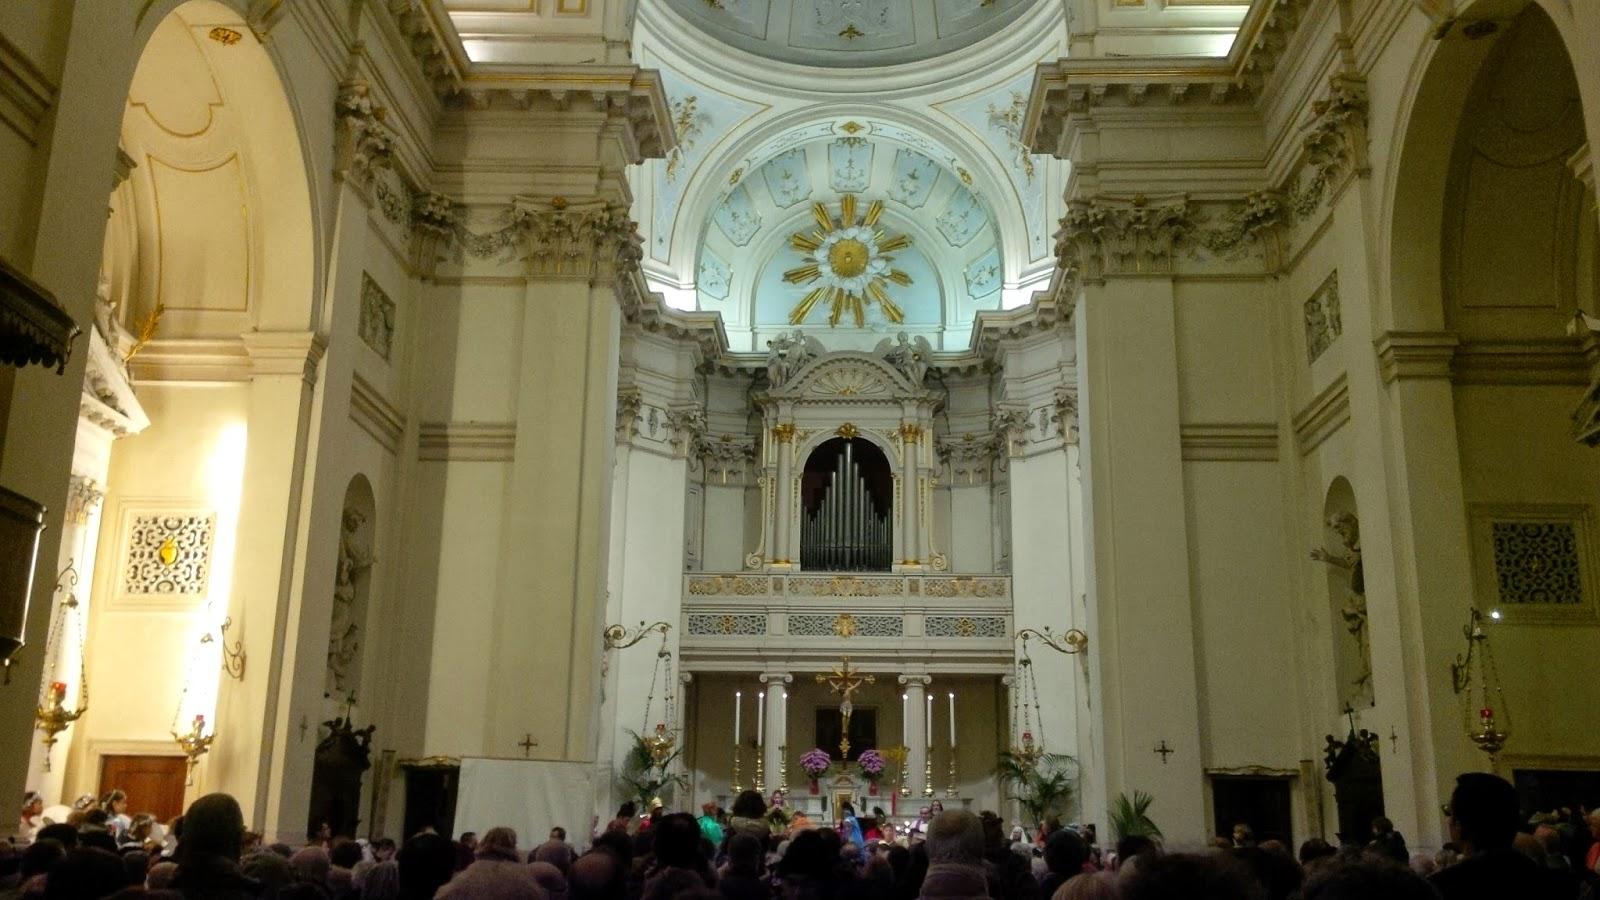 The procession and hundreds of spectators in Chiesa dei Filippini in Vicenza